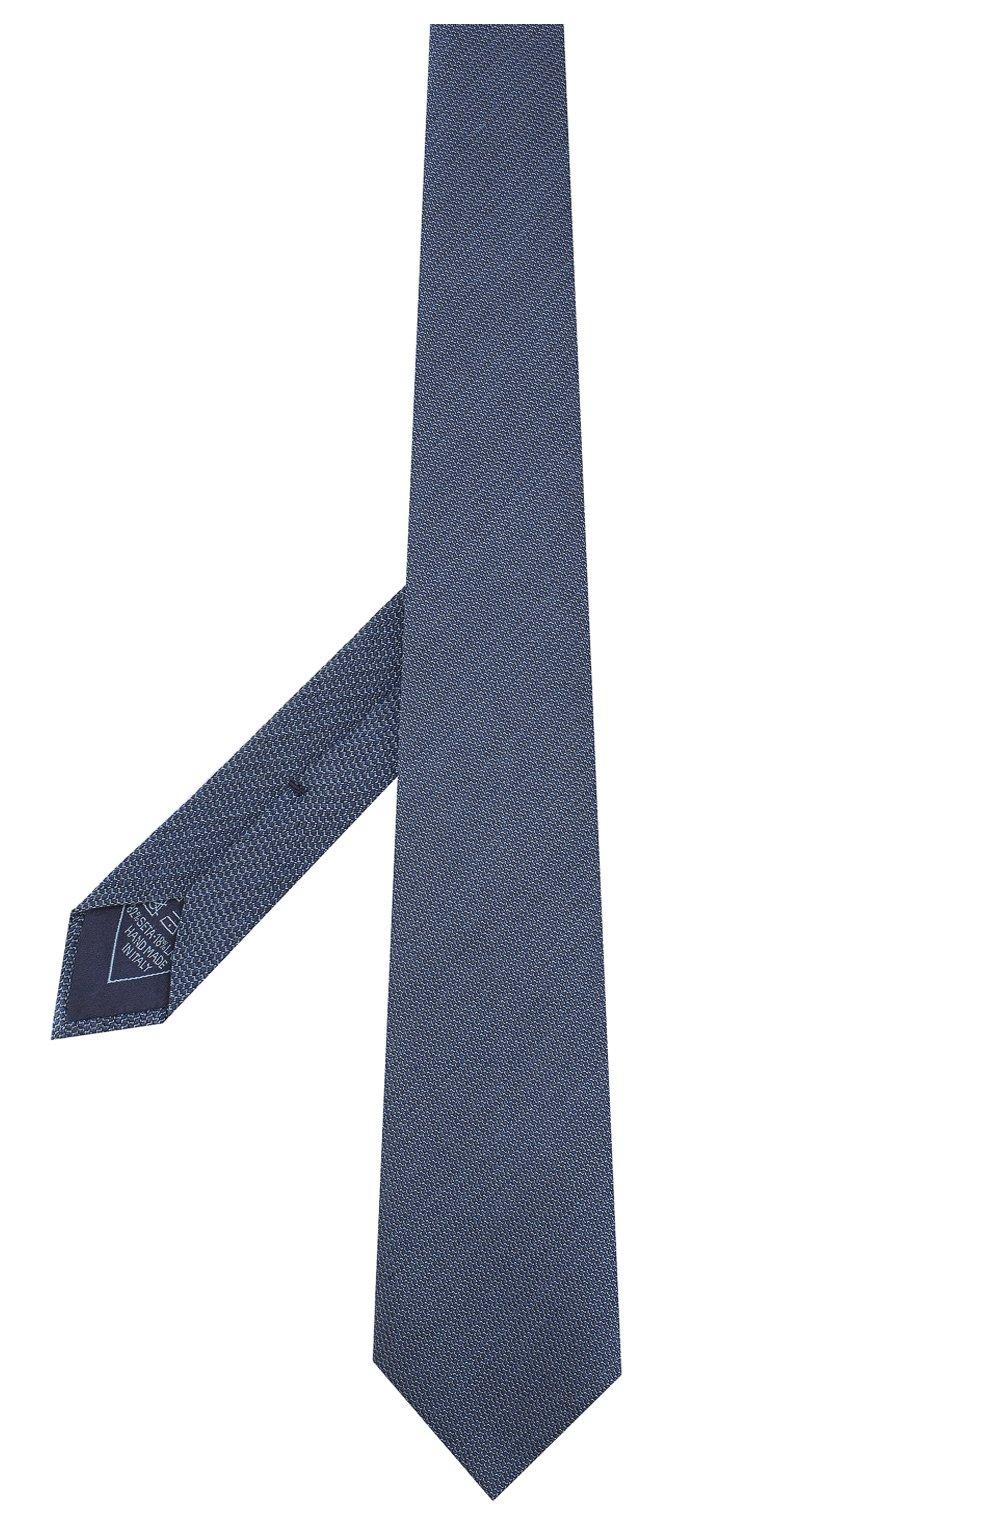 Мужской галстук из смеси шелка и шерсти BRIONI синего цвета, арт. 062I00/08438   Фото 2